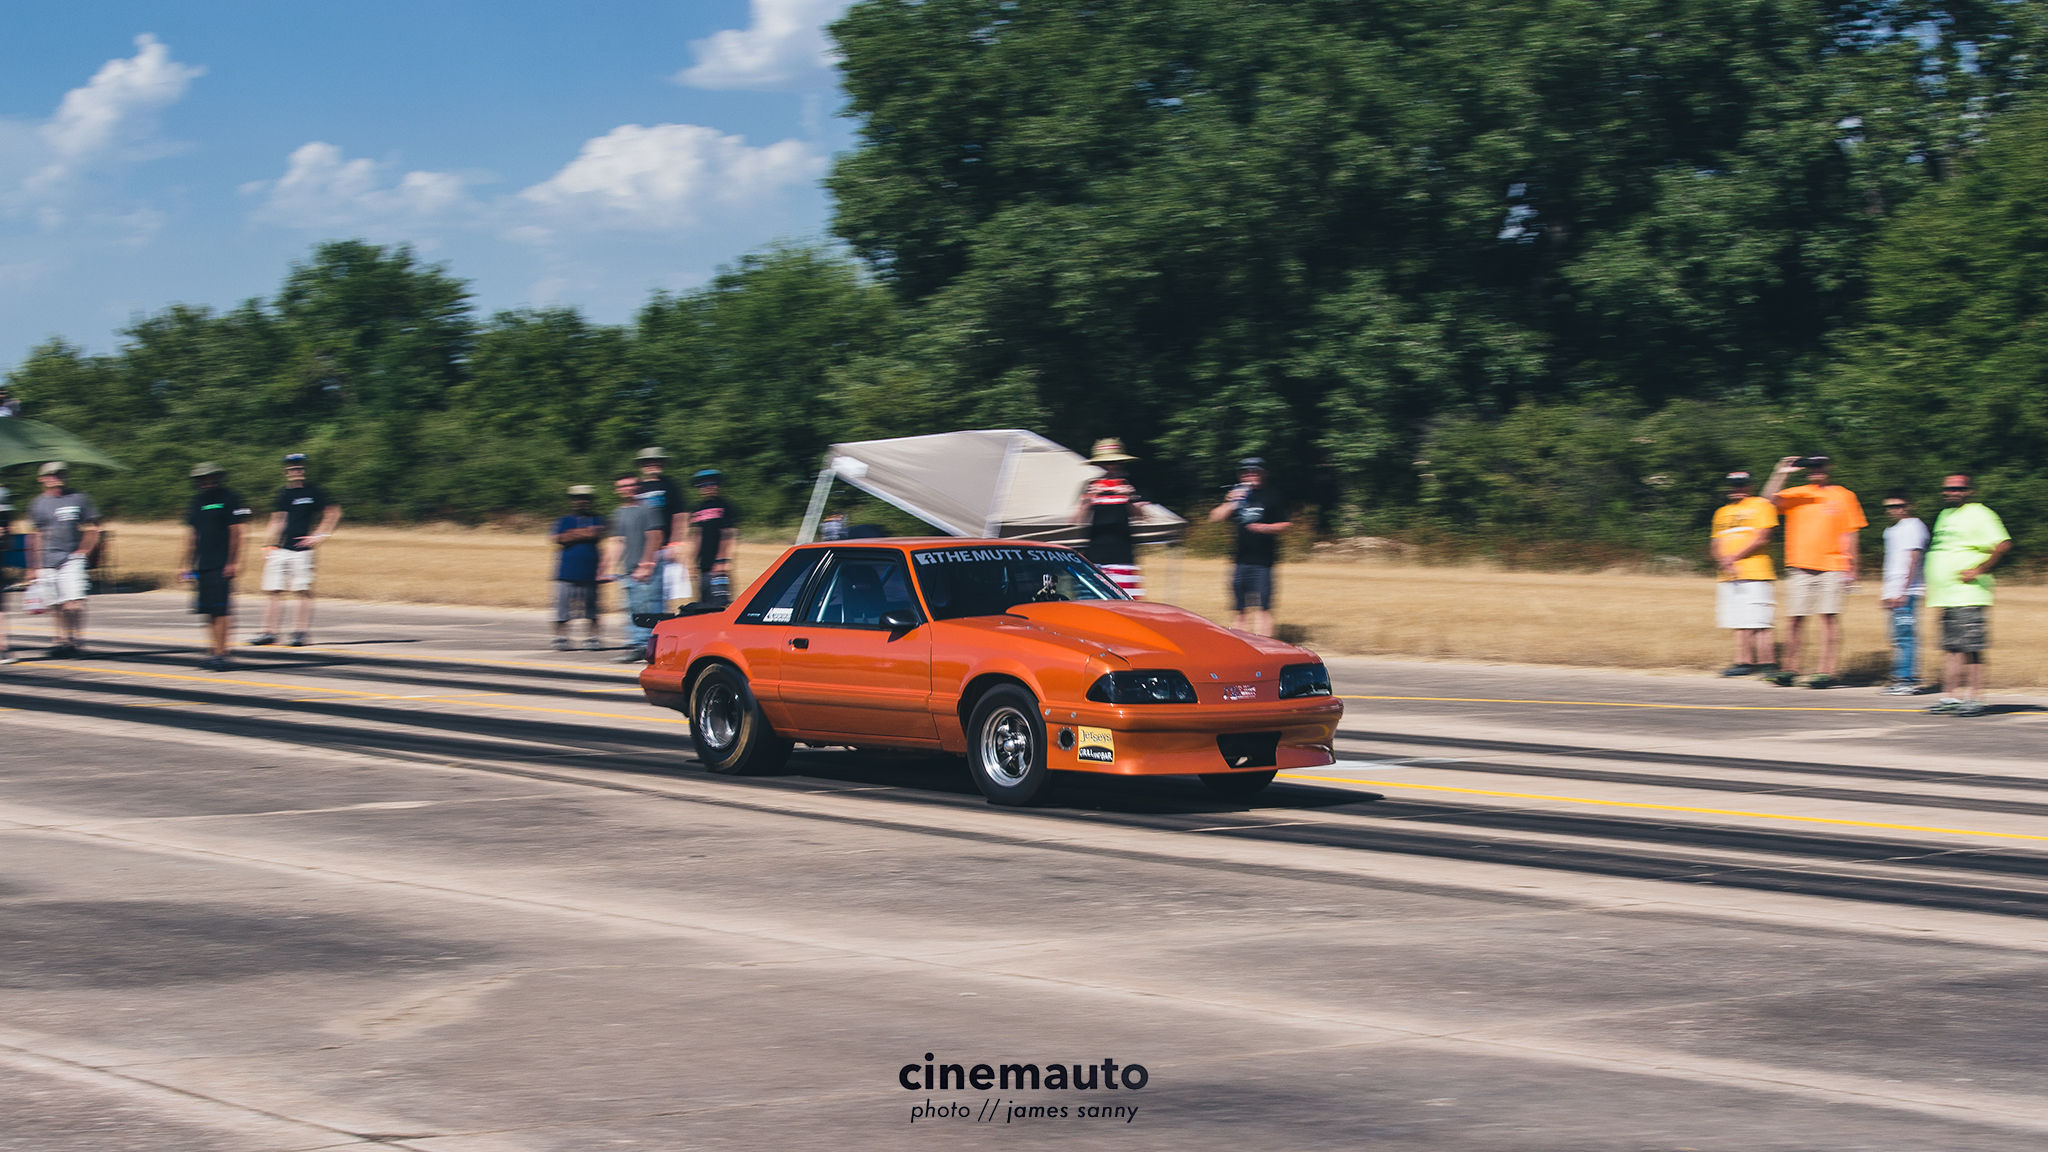 wichita-automotive-photography-kansas-racecar-15.jpg